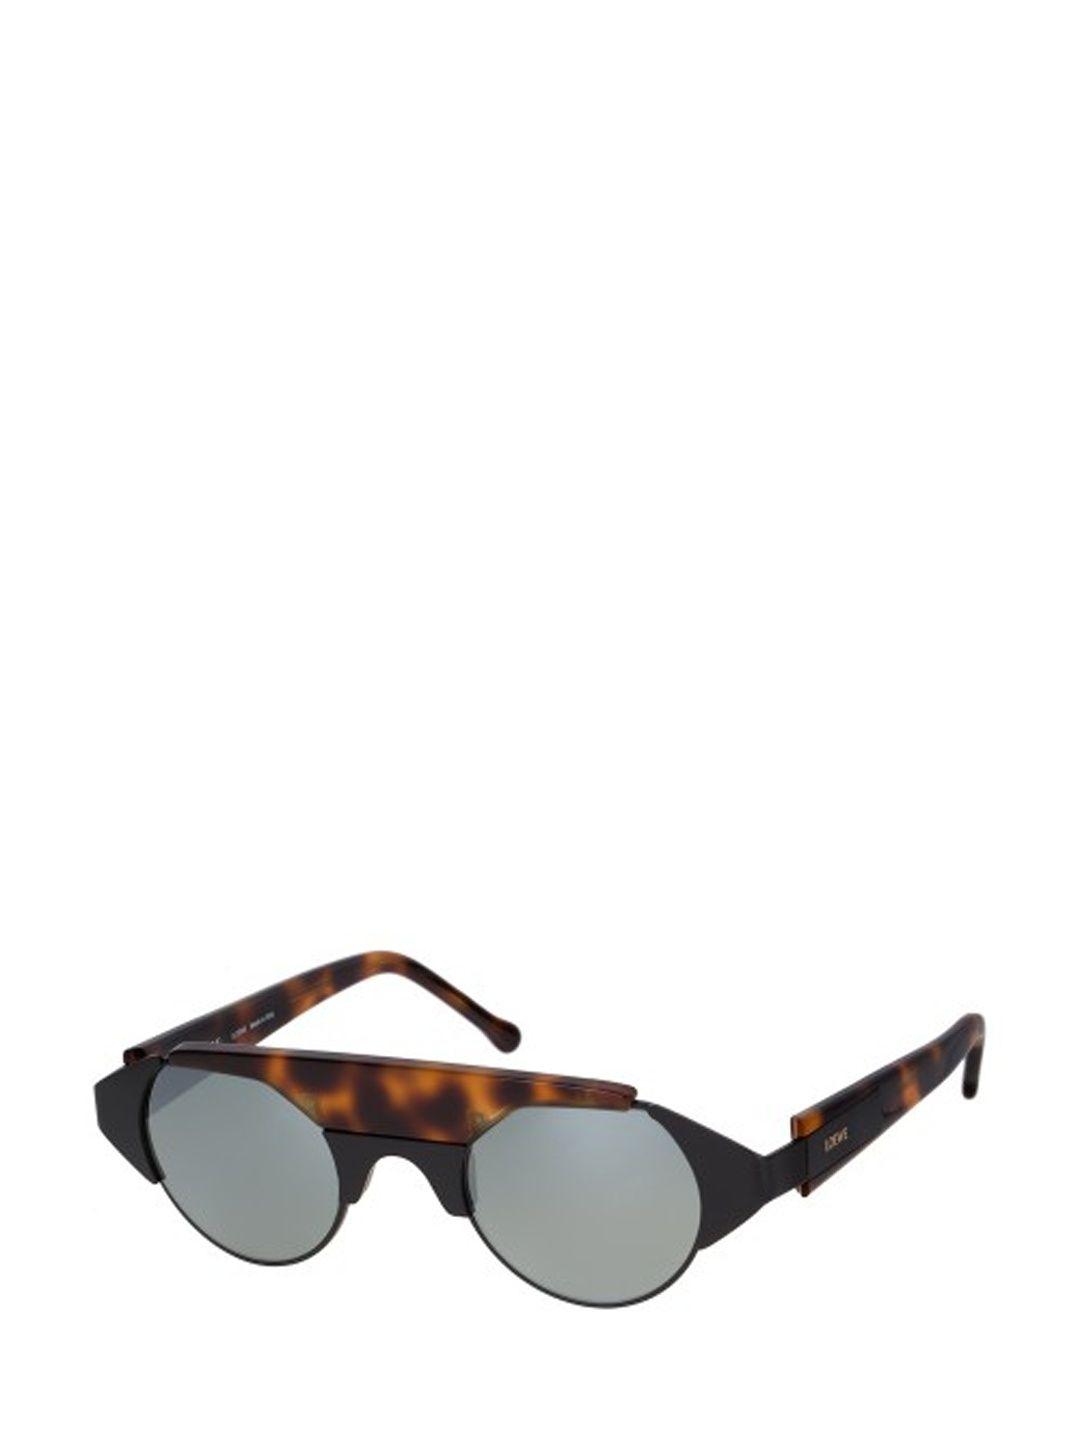 LOEWE Sunglasses. #loewe #